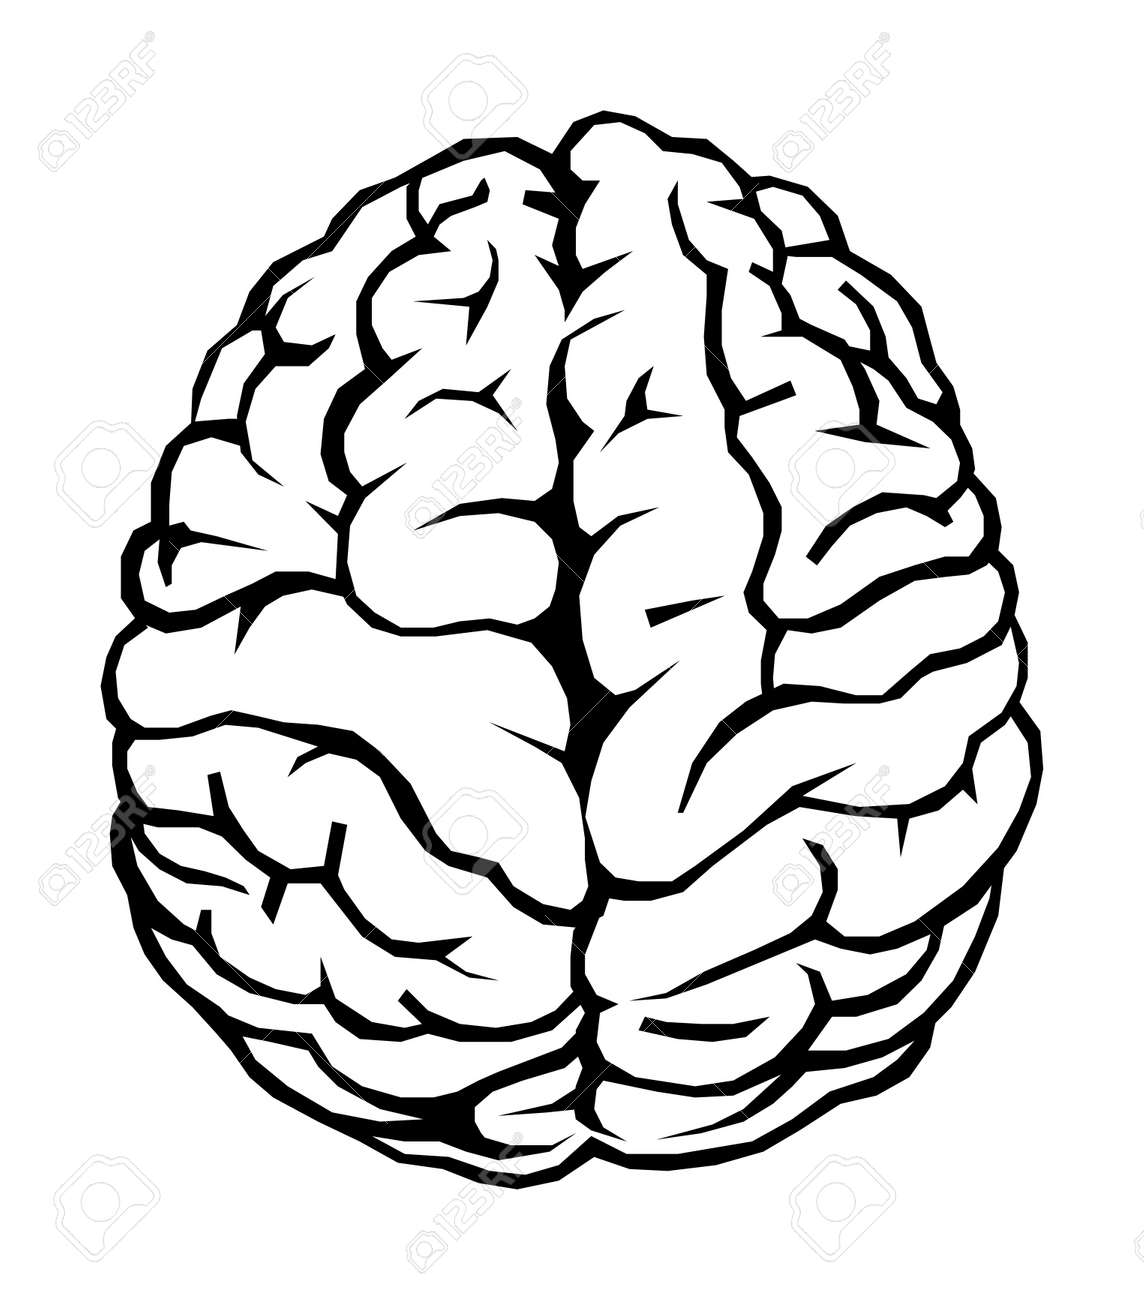 Human brain Stock Photo - 494890